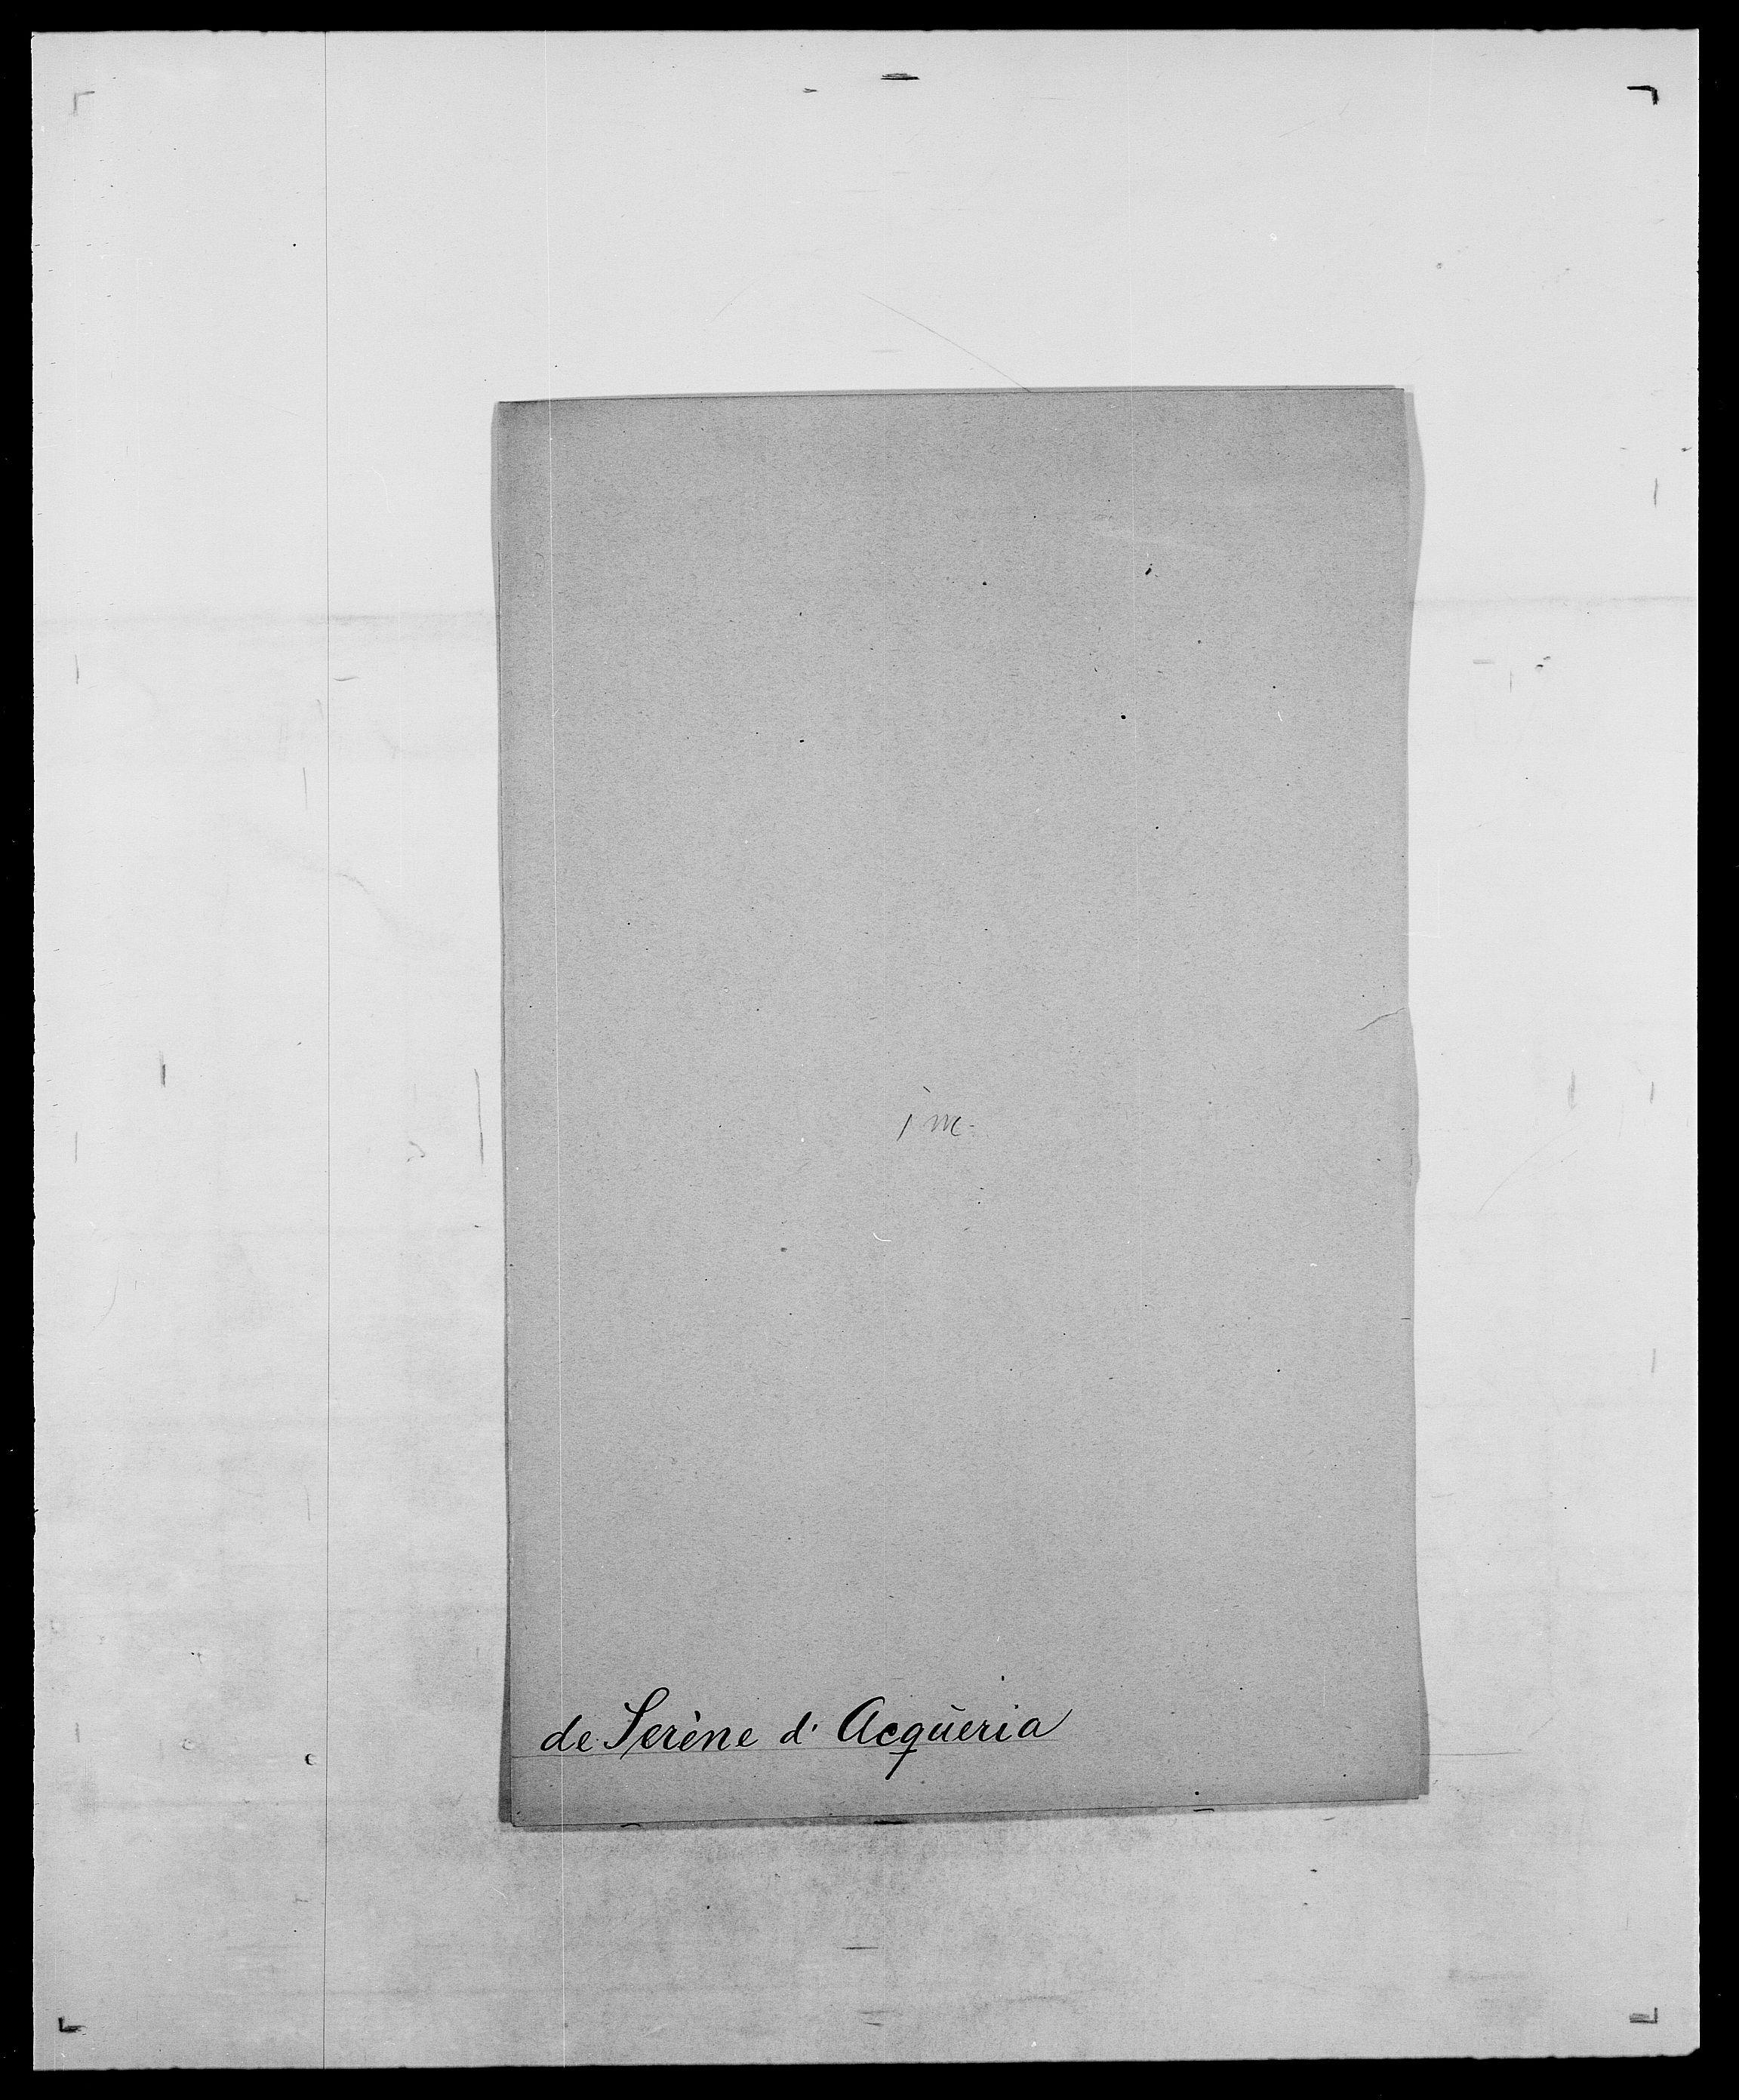 SAO, Delgobe, Charles Antoine - samling, D/Da/L0035: Schnabel - sjetman, s. 717